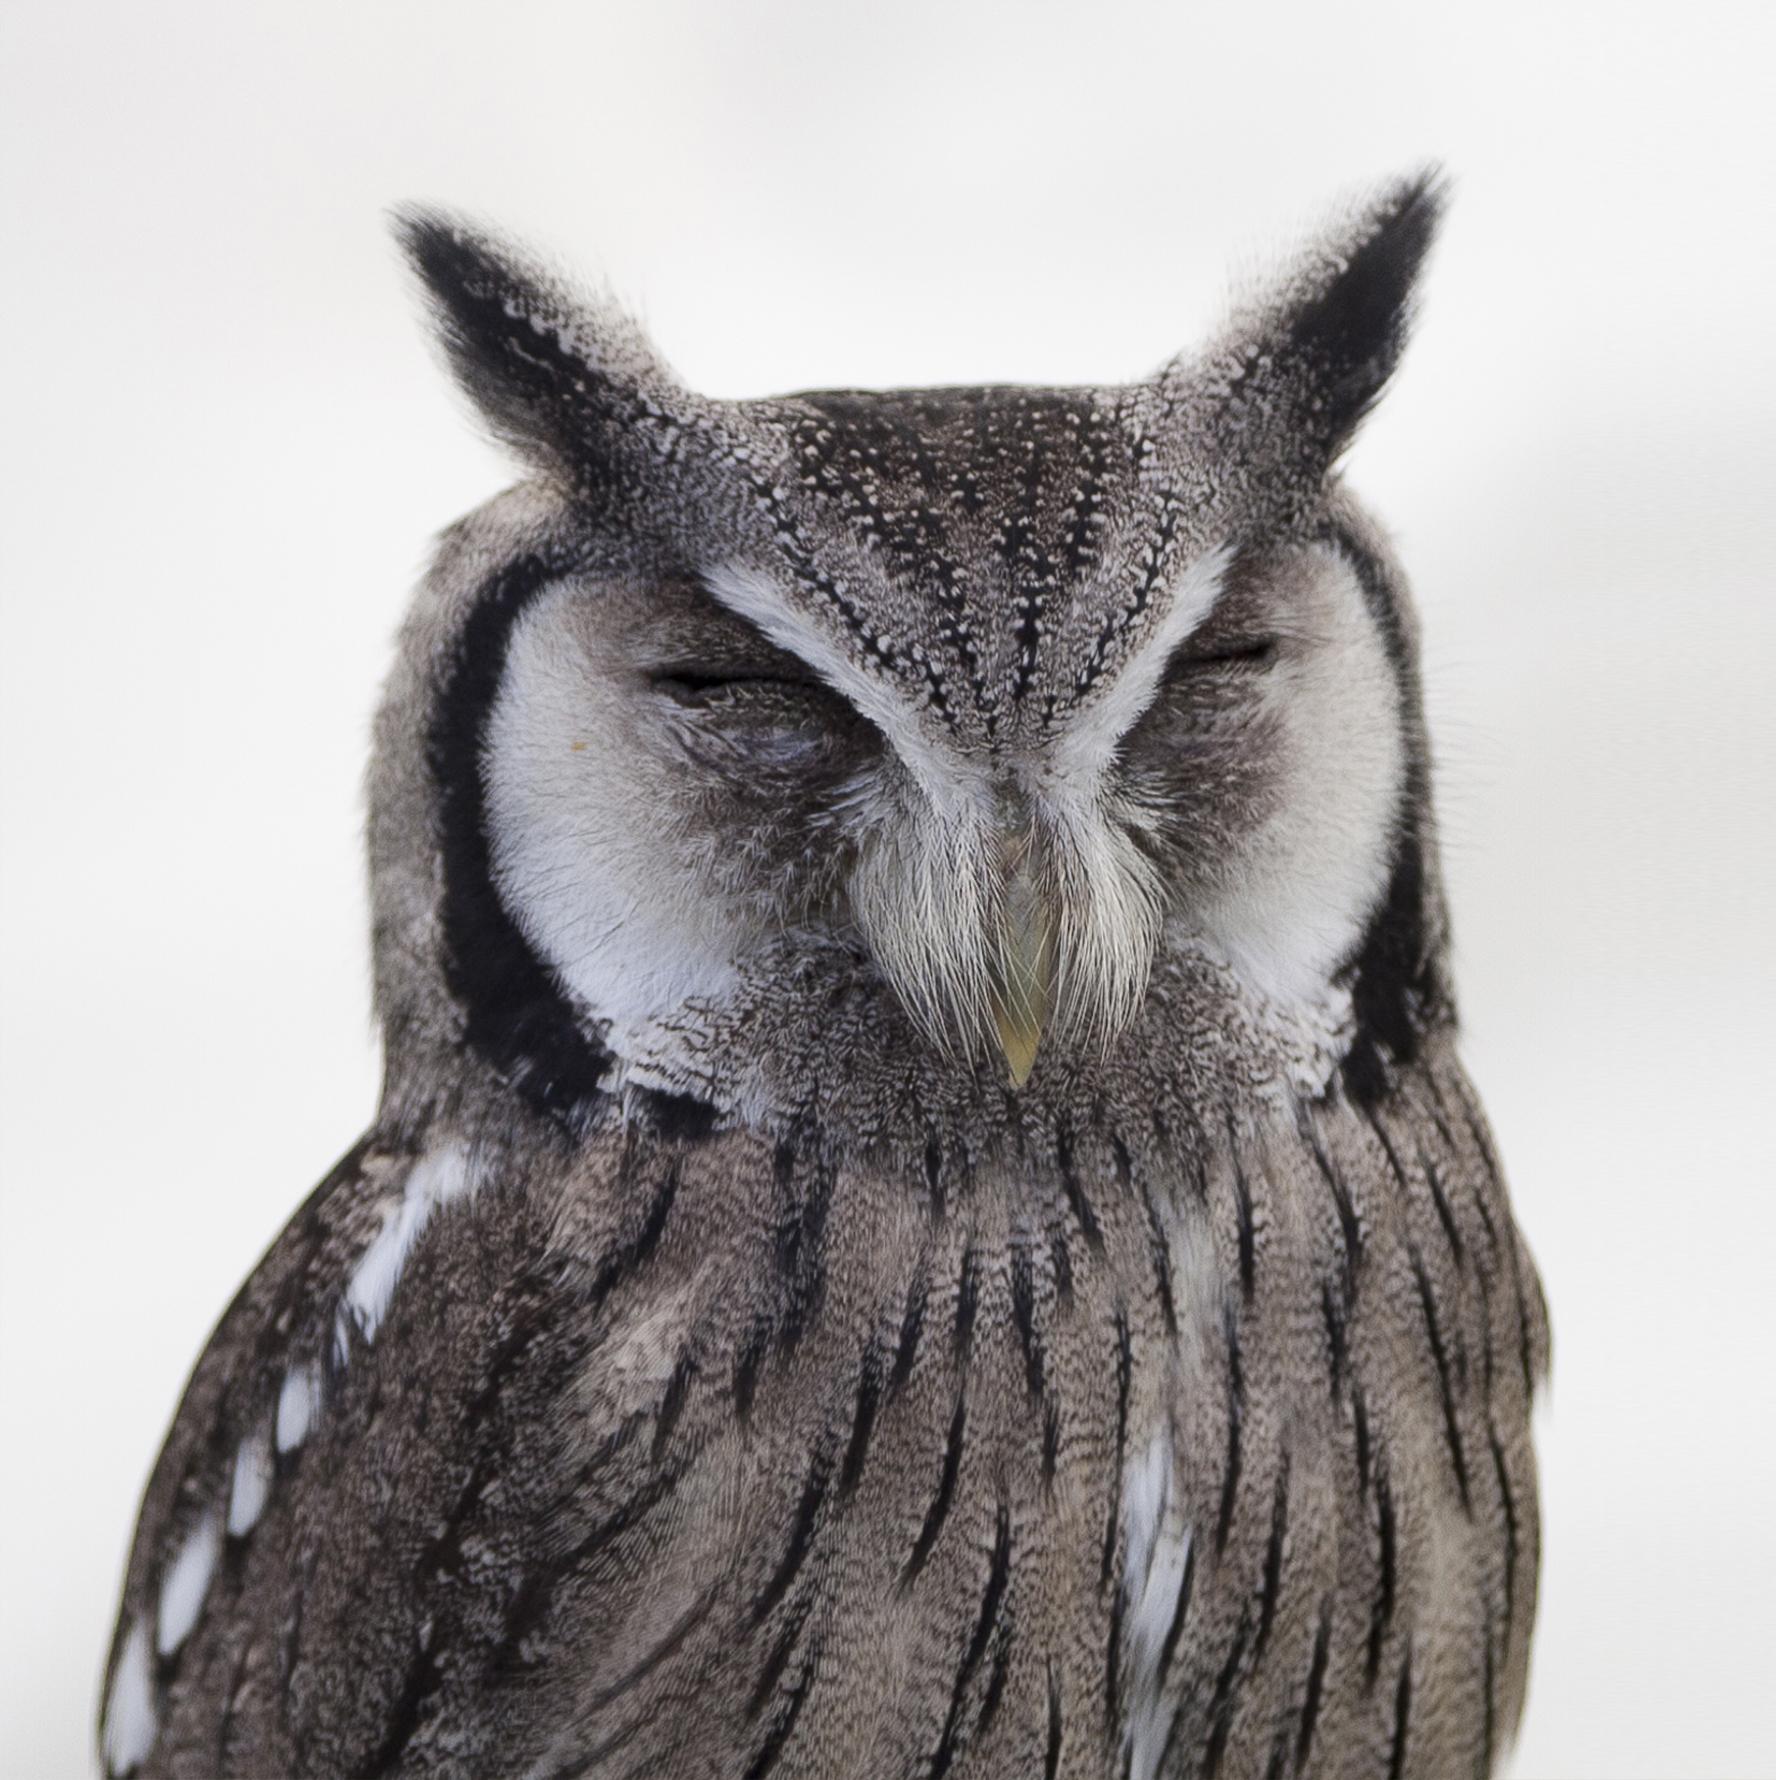 Eagle Wallpaper Iphone X White And Black Owl 183 Free Stock Photo